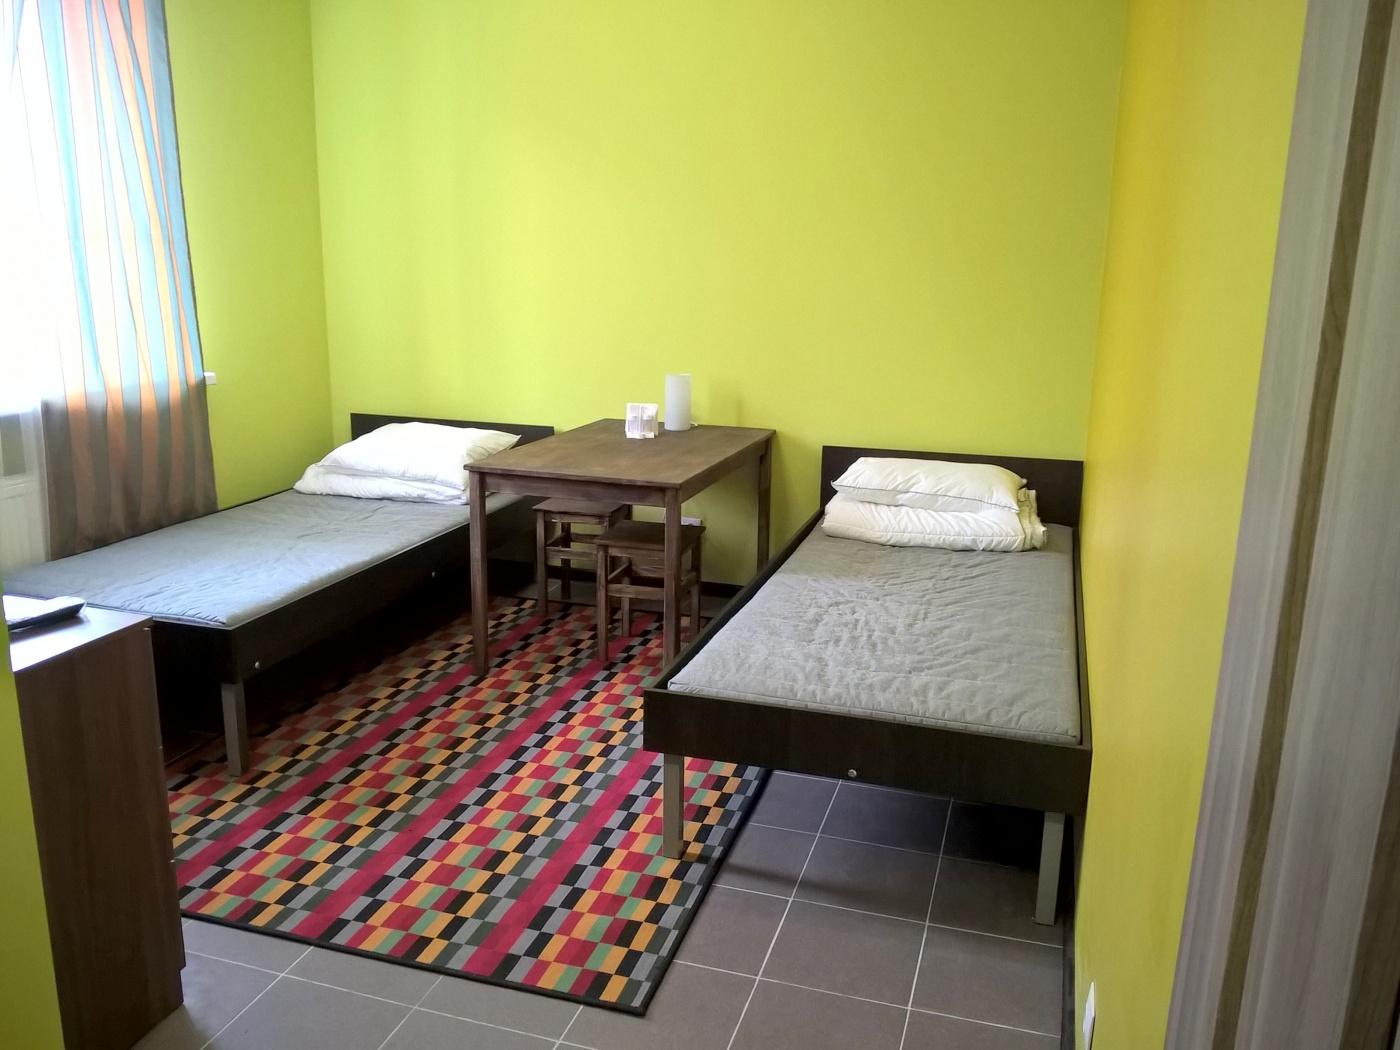 База отдыха «Marlin-KZN» Республика Татарстан 2-комнатный номер на втором этаже, фото 2